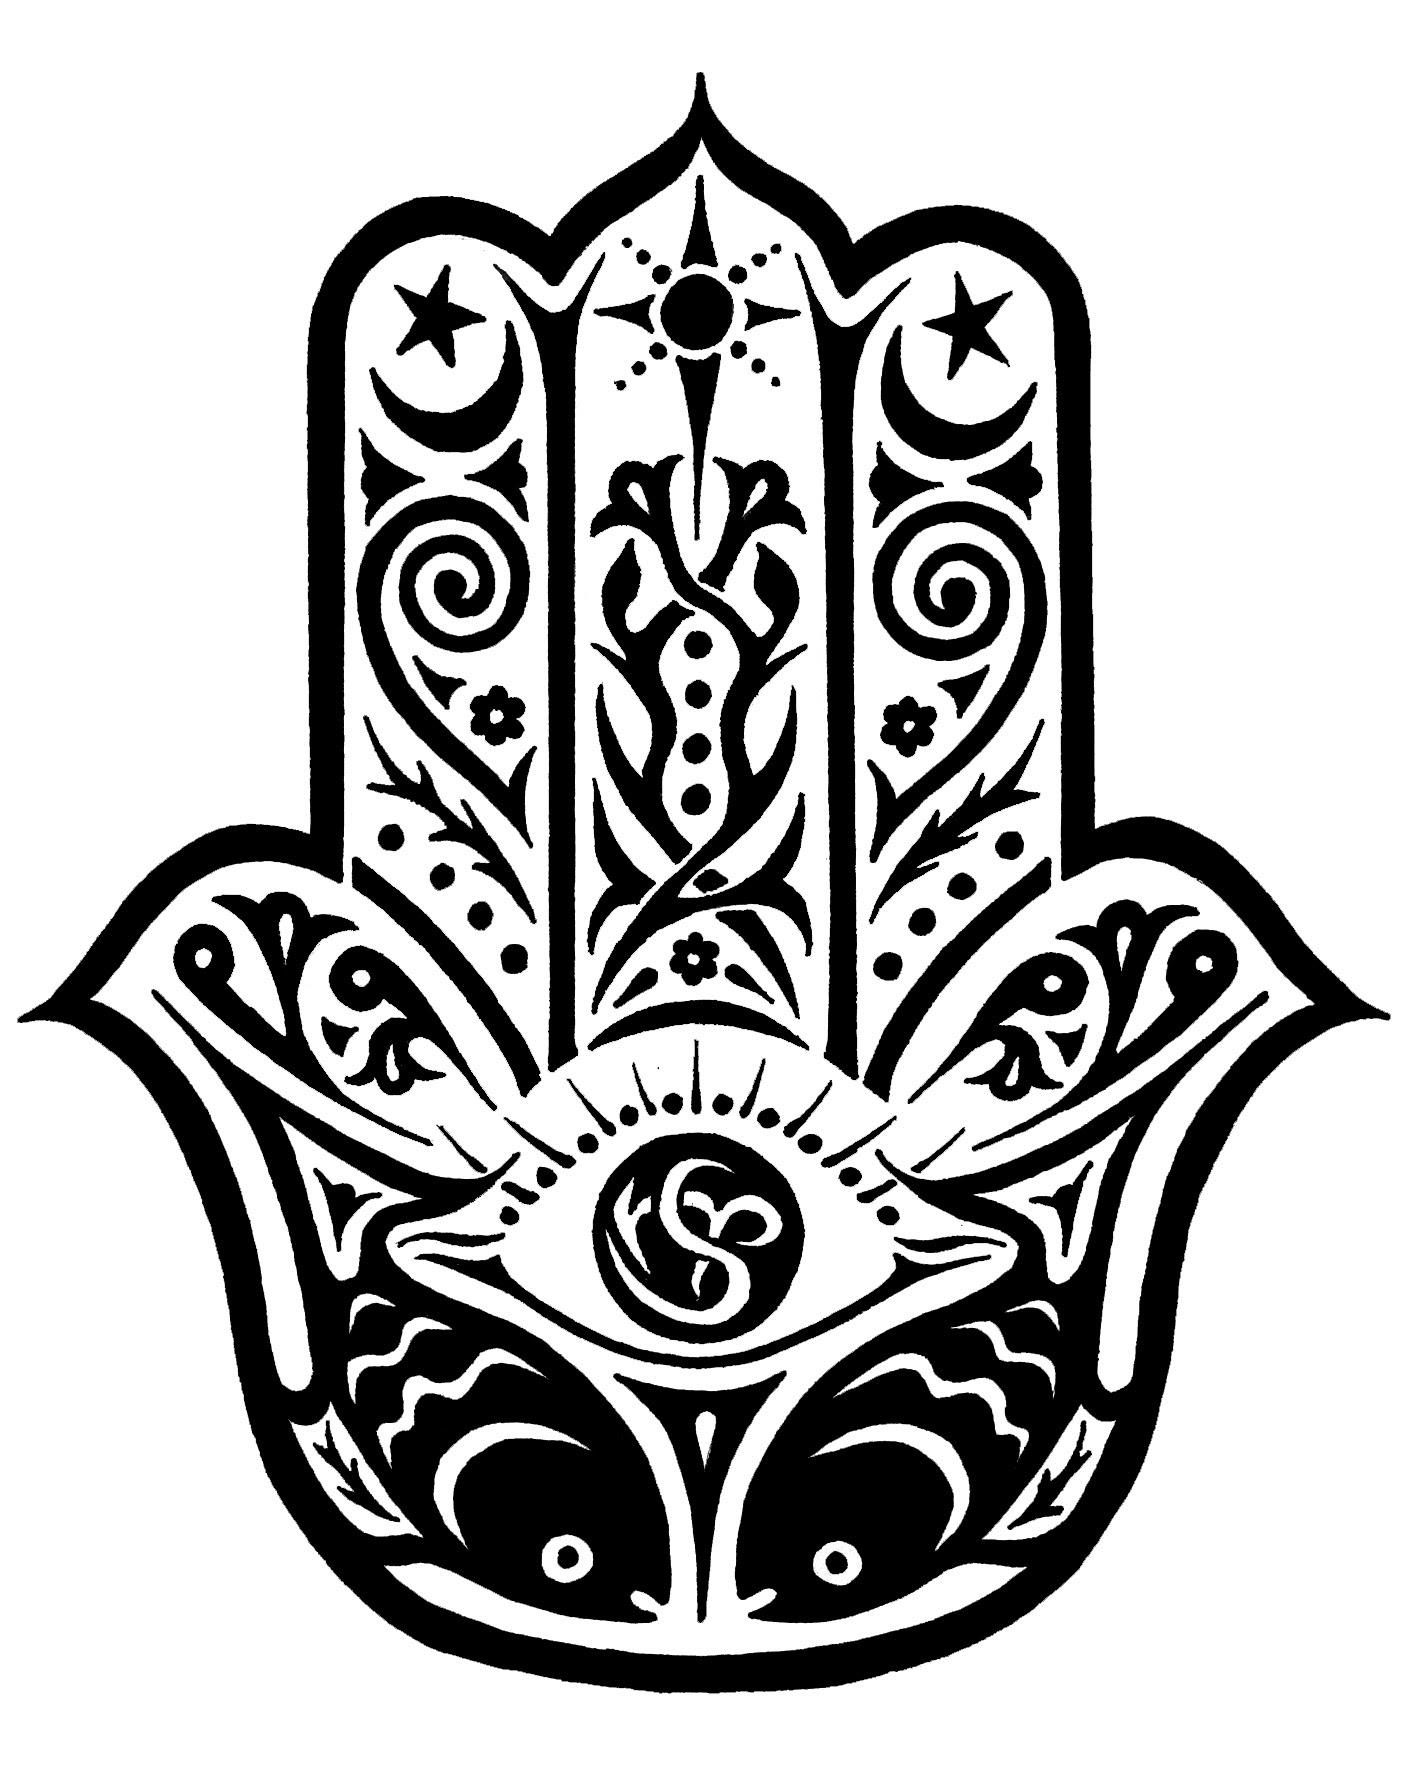 76 Hand Symbol Meaning Hamsa Hand Meaning Hamsa Symbol